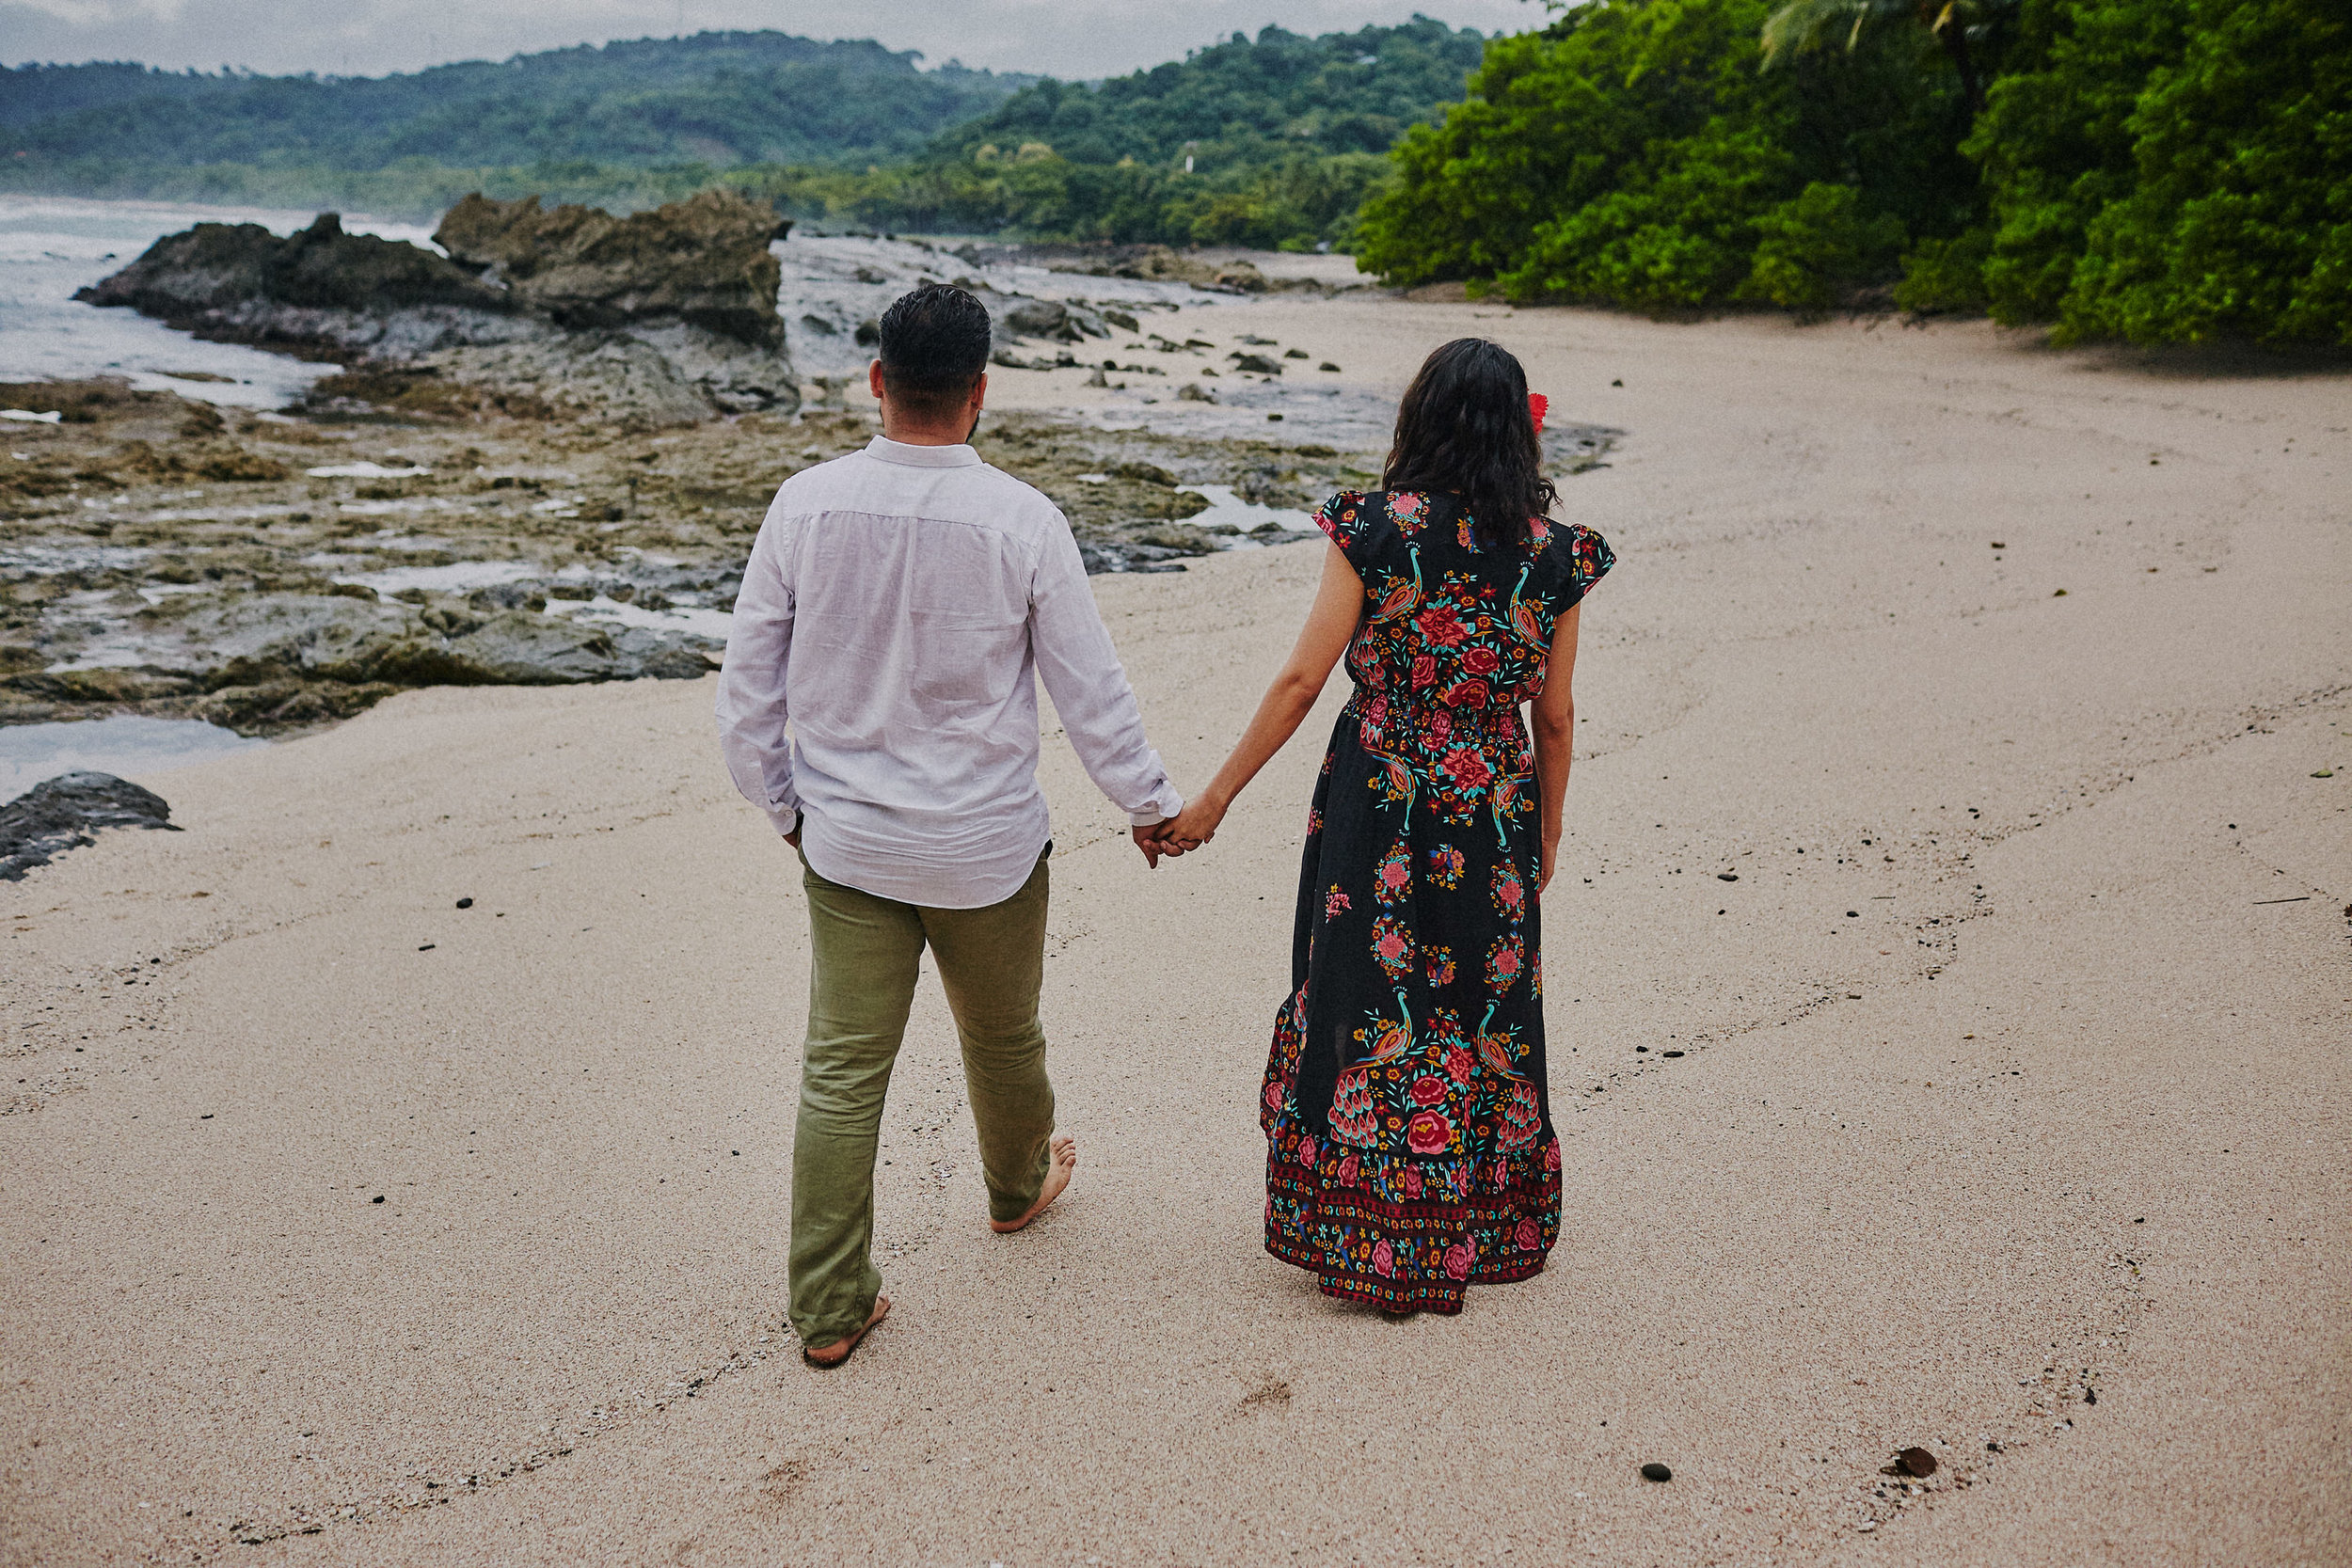 Beach_Engagement_Santa_Teresa 01.jpg